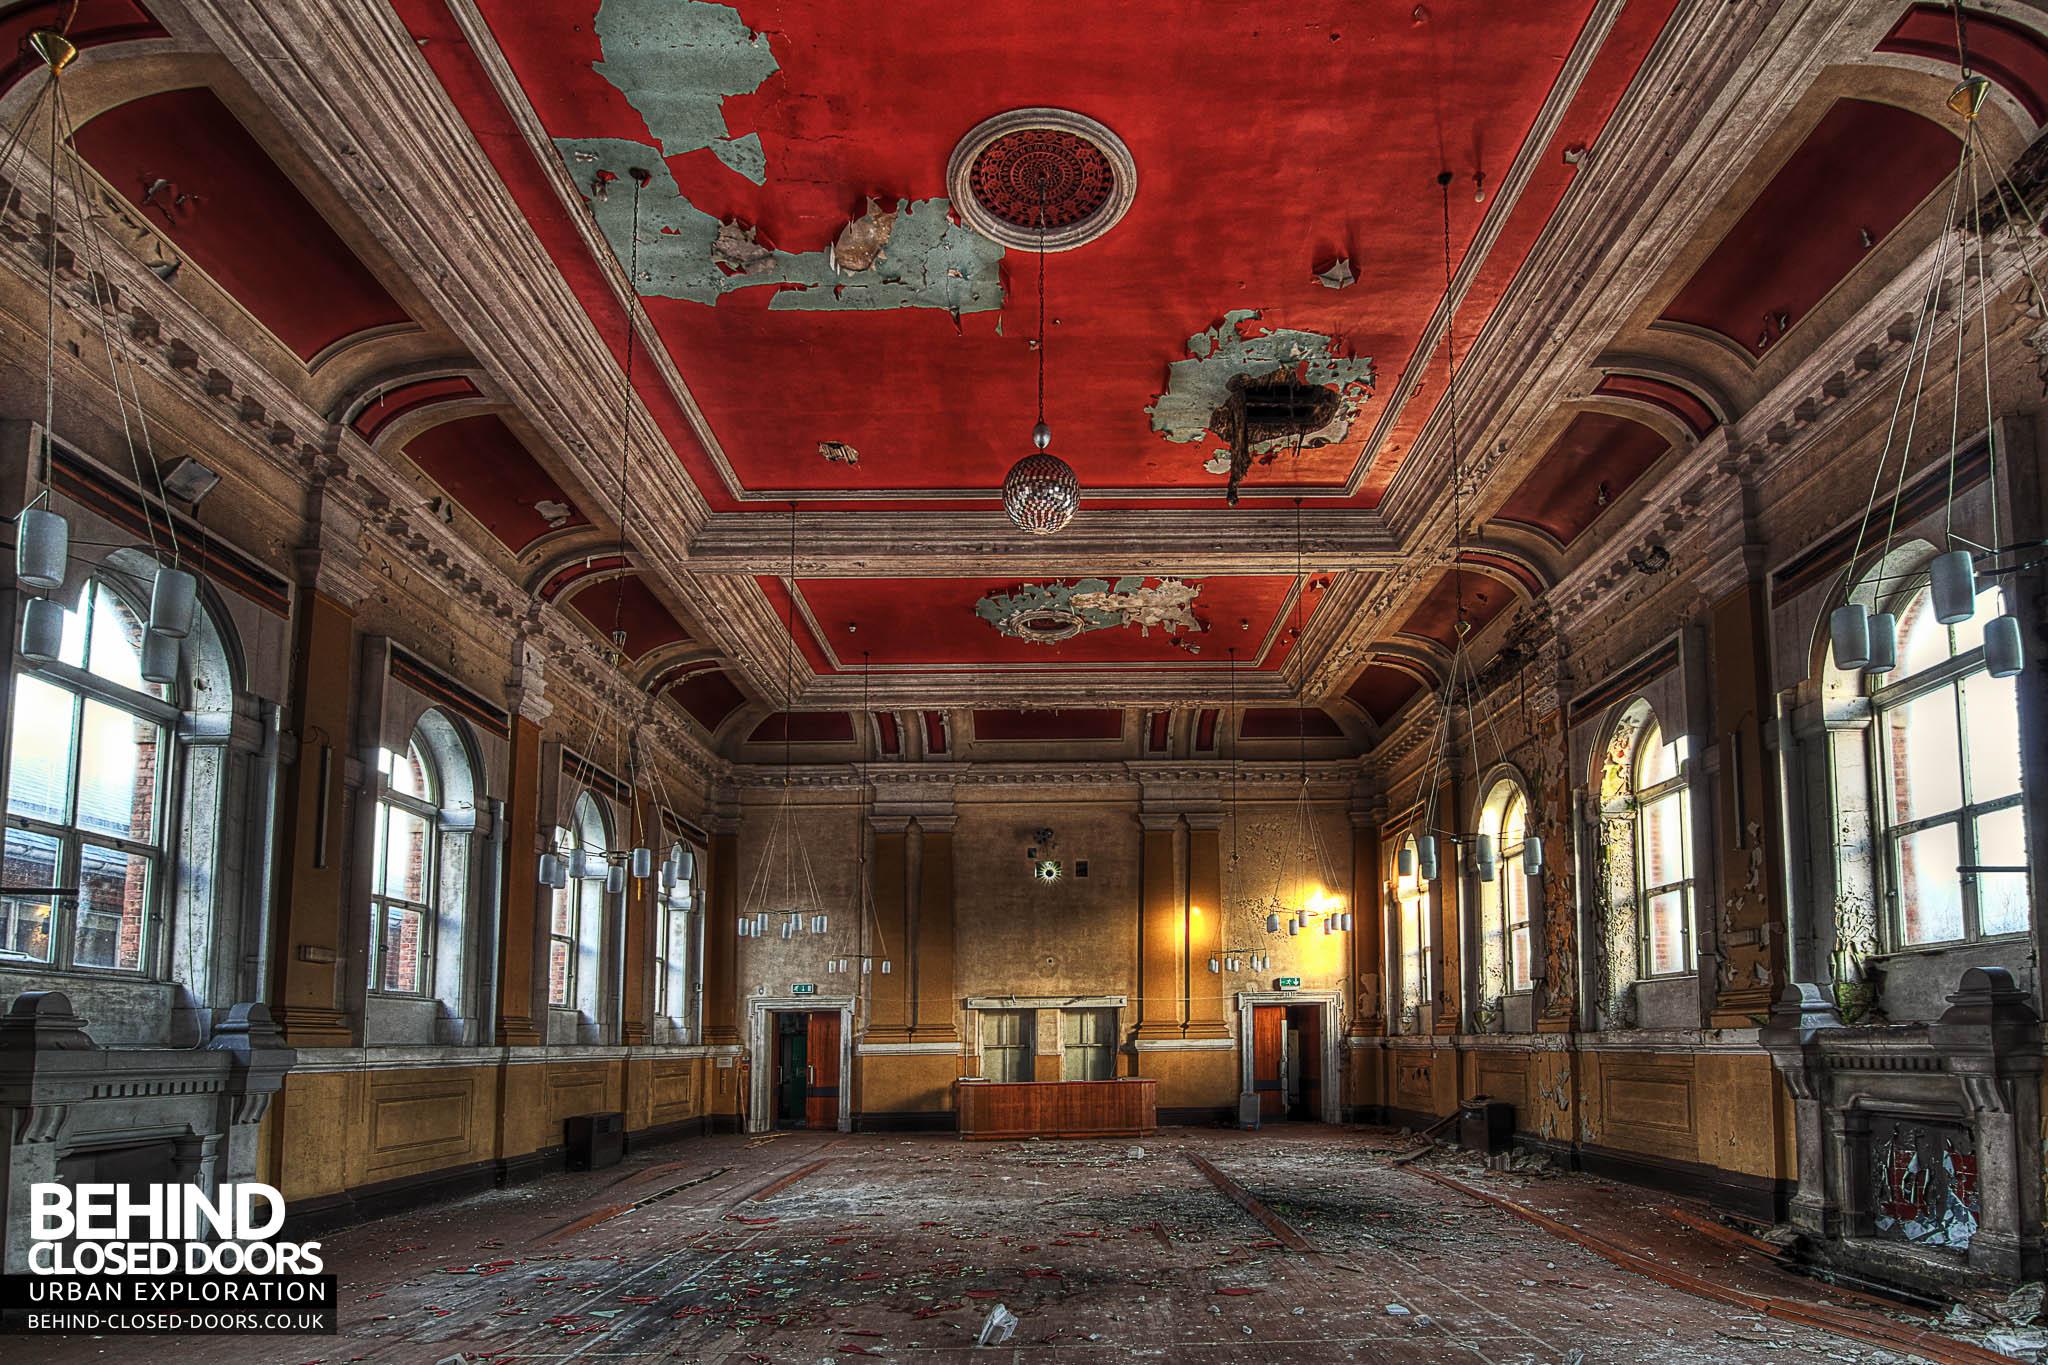 St Georges Hospital Northumberland Lunatic Asylum Morpeth Urbex Behind Closed Doors Urban Exploring Abandoned Locations